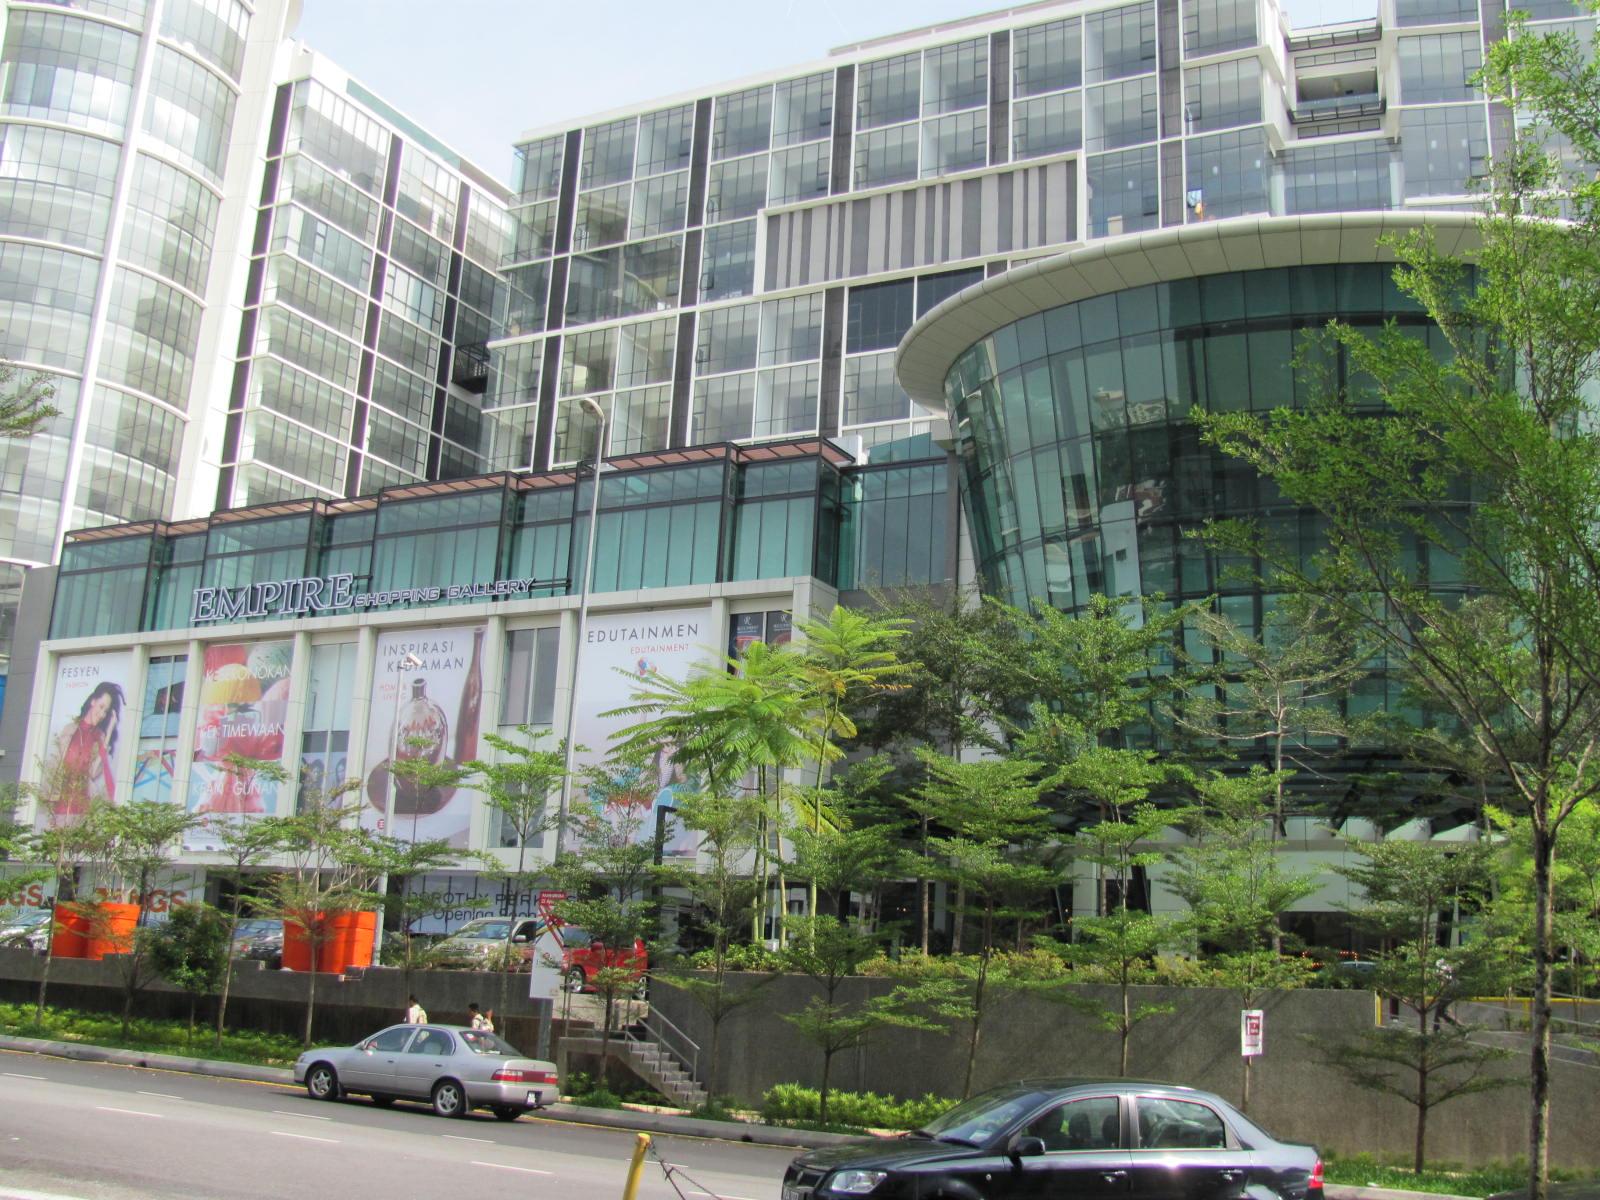 Empire Shopping Gallery -- latest shopping mall in Subang Jaya   Whatever I see. hear. read. feel. etc